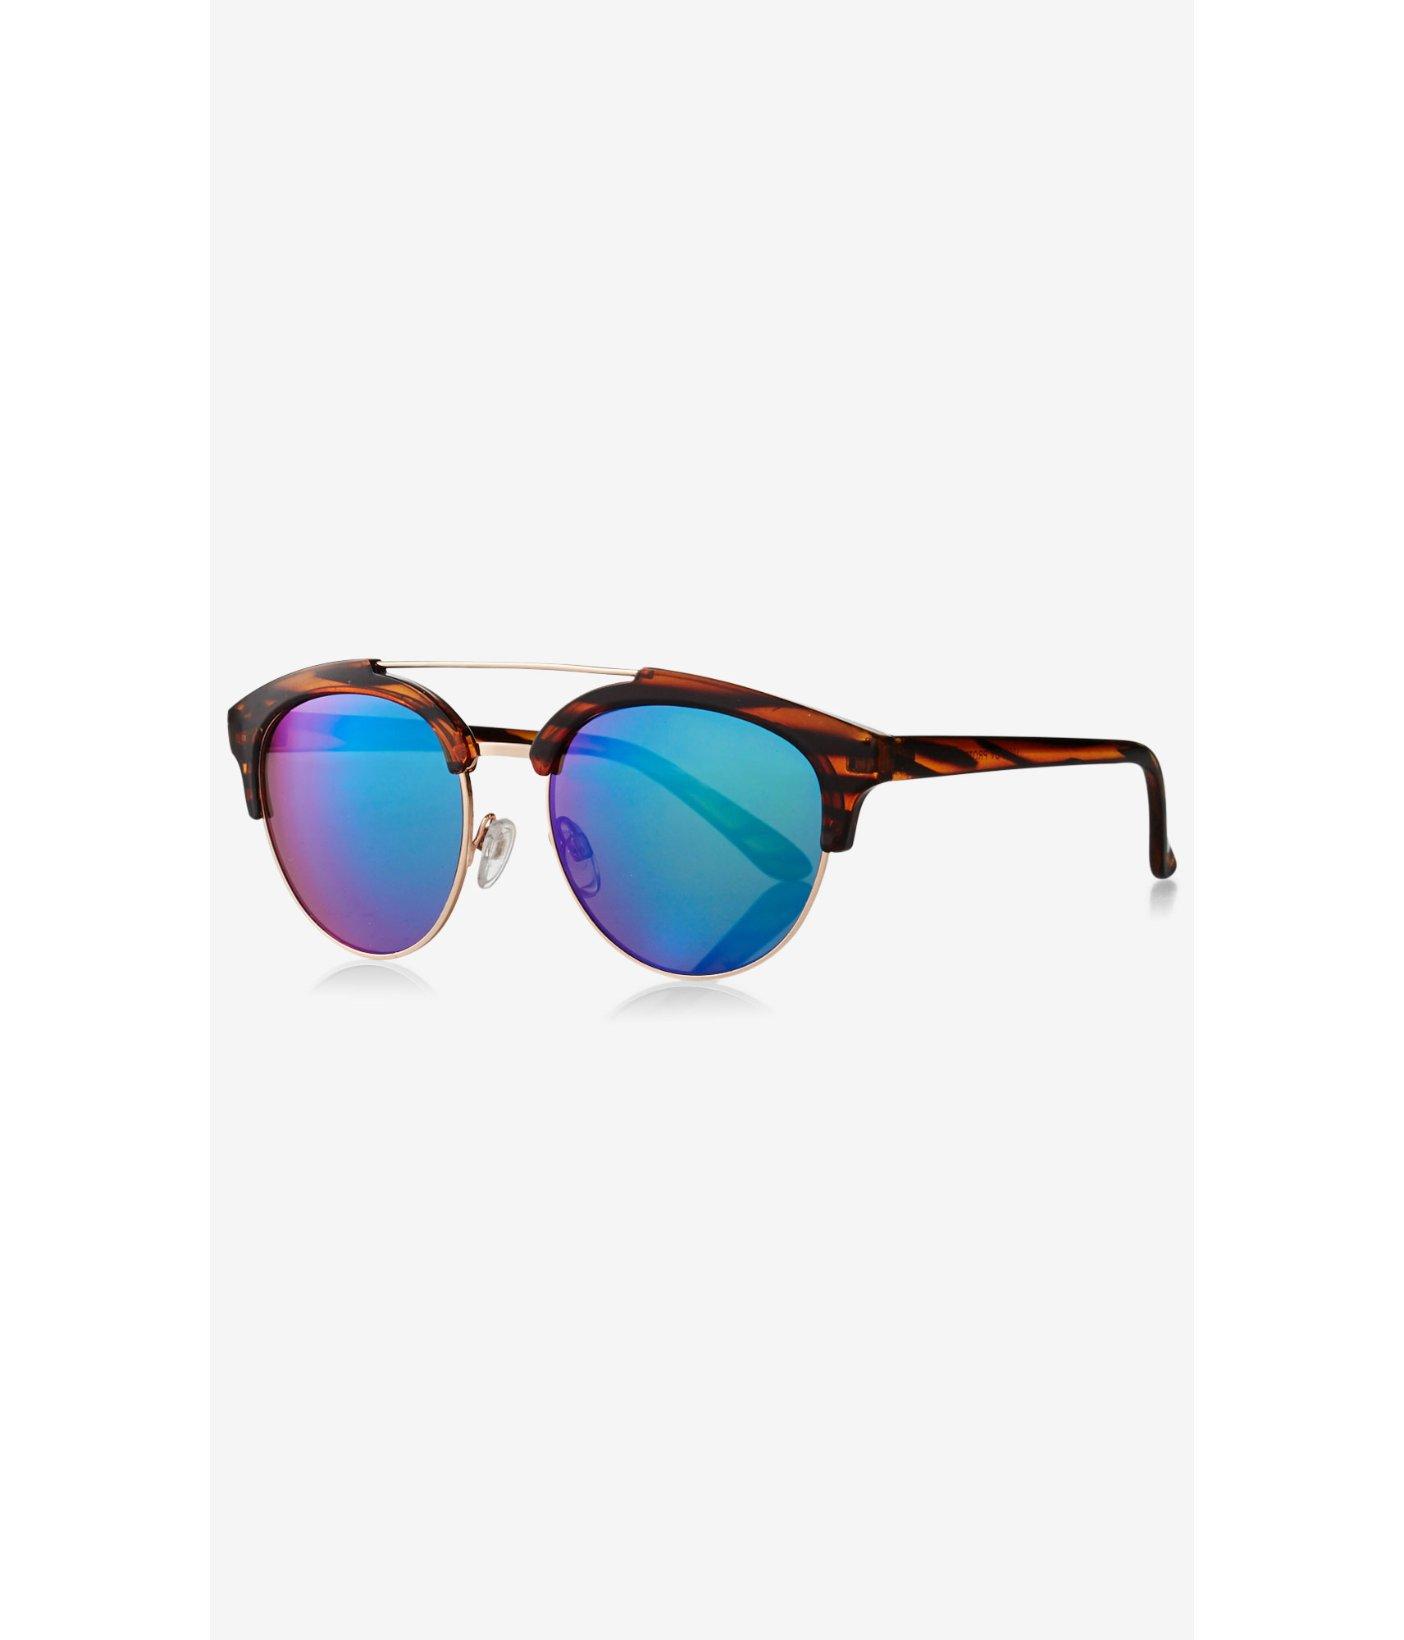 Brow Bar Sunglasses  express retro brow bar sunglasses in blue lyst